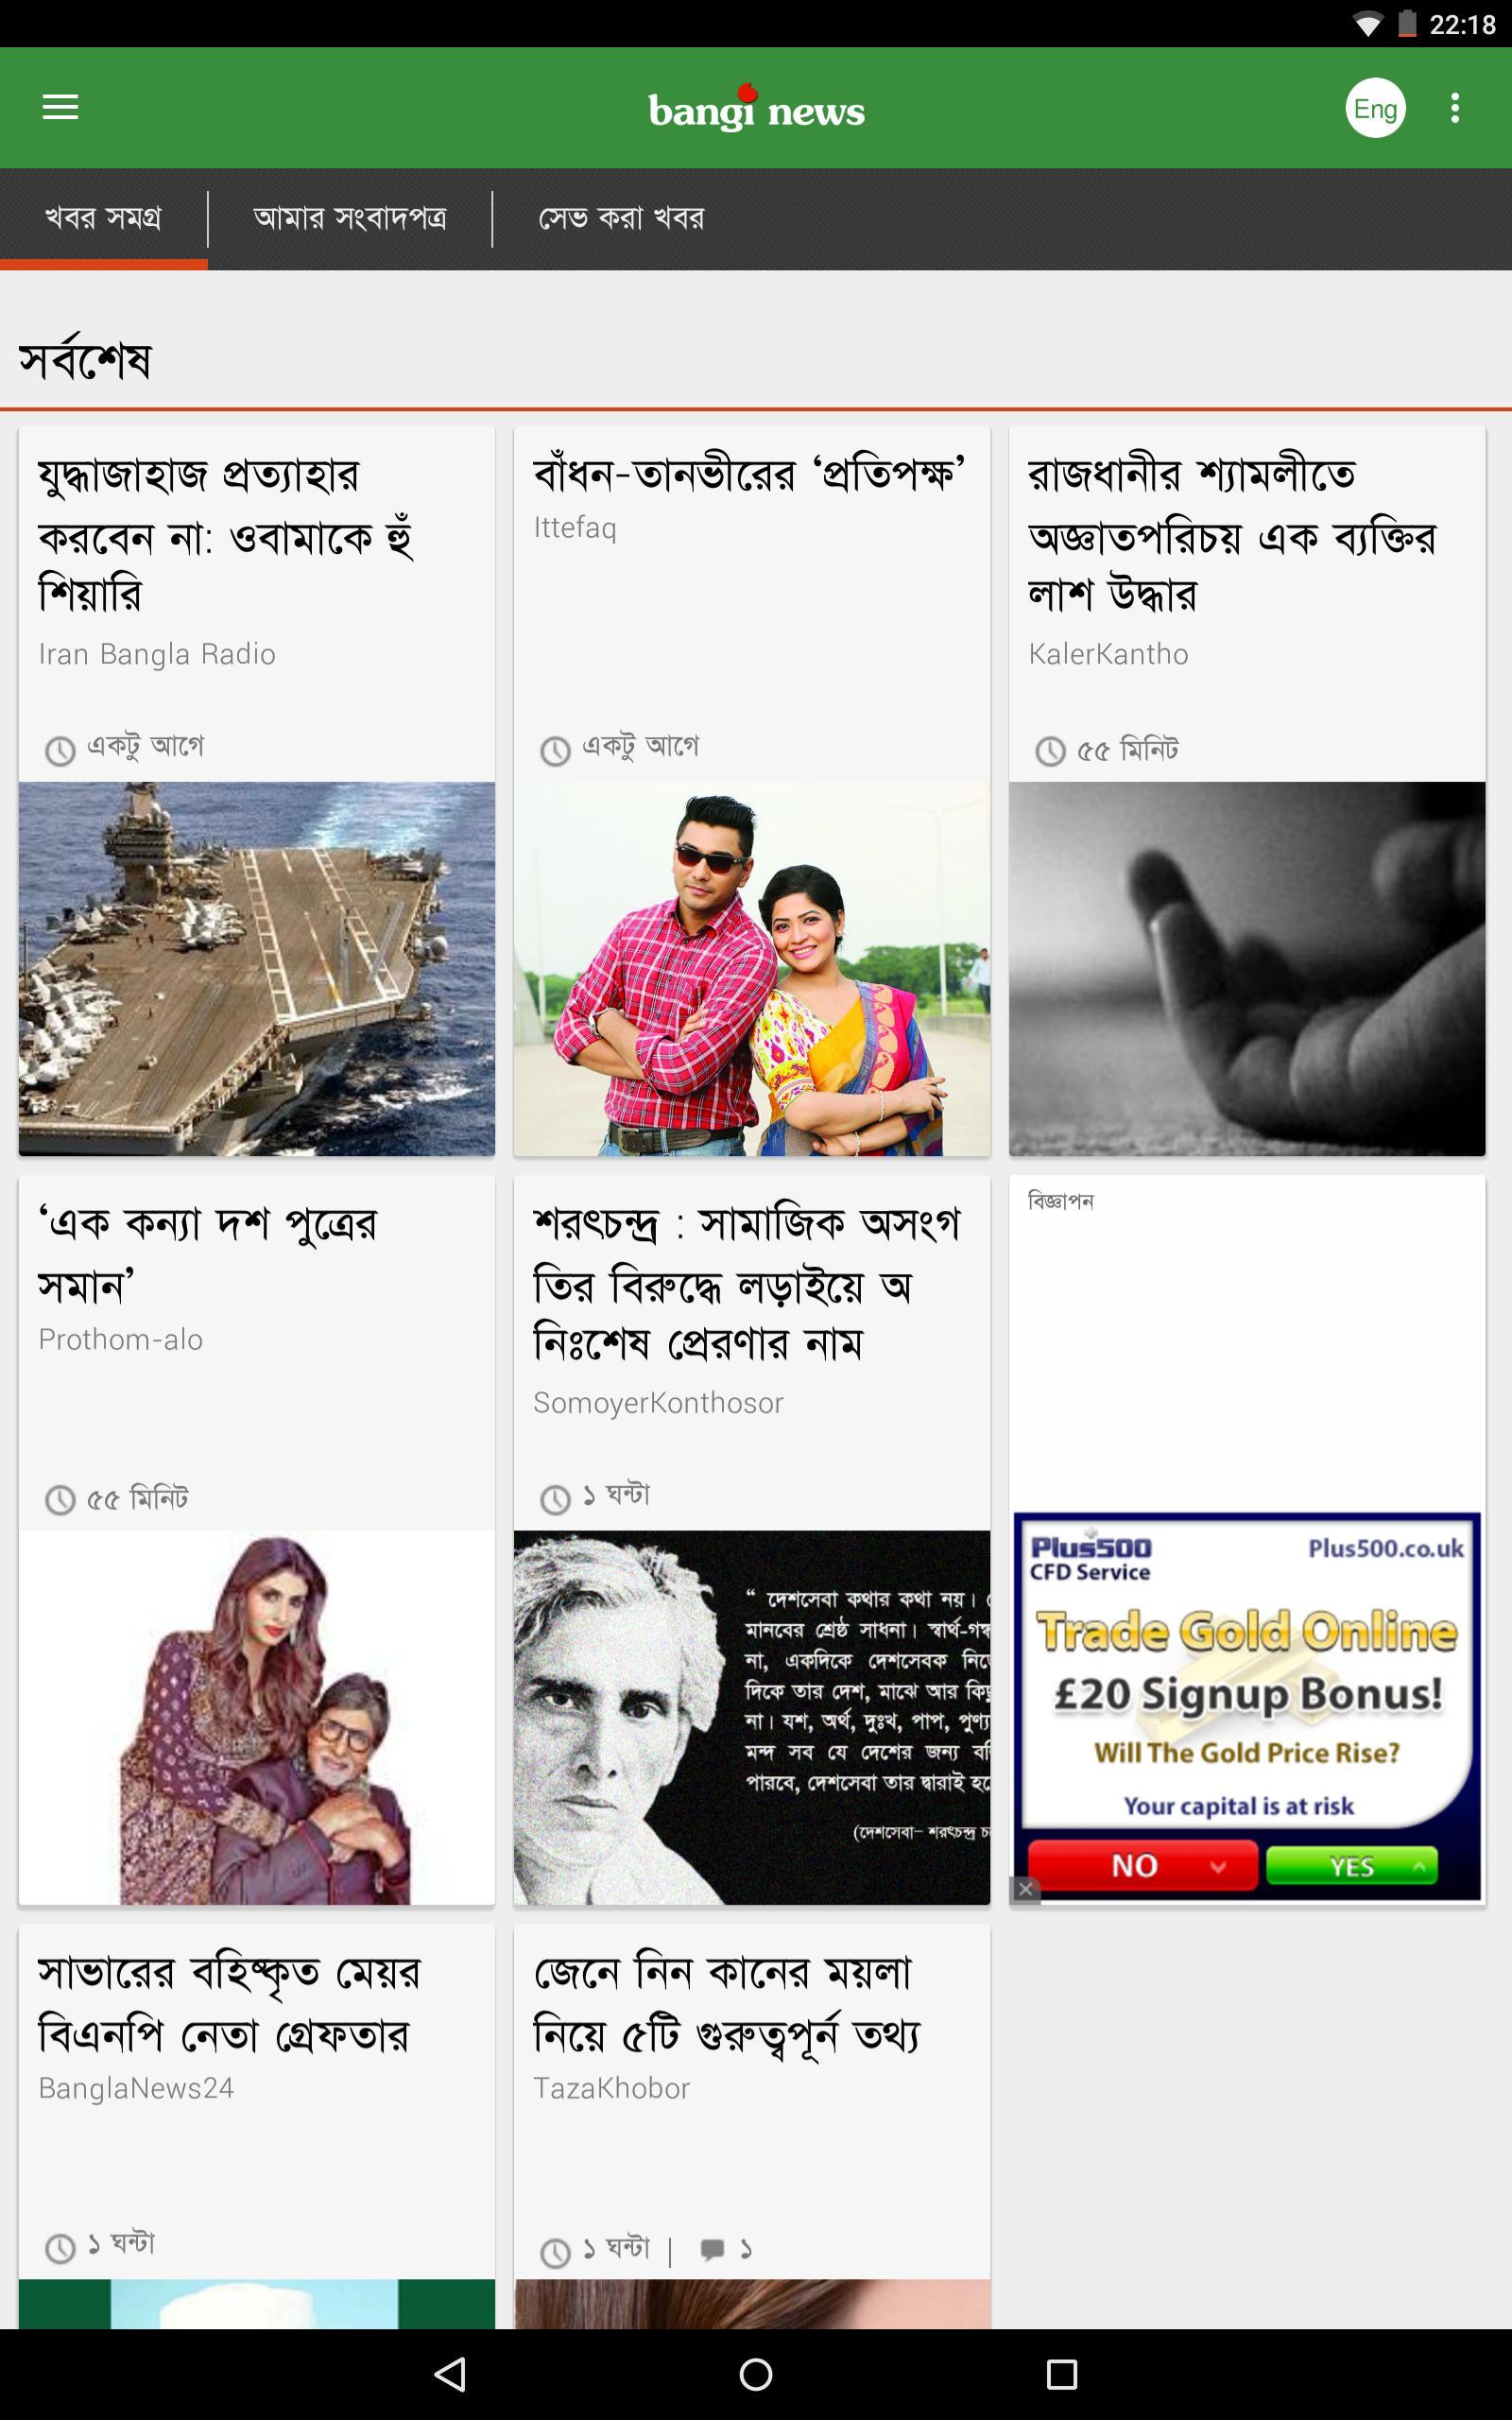 Bangla News & TV: Bangi News 13 تصوير الشاشة